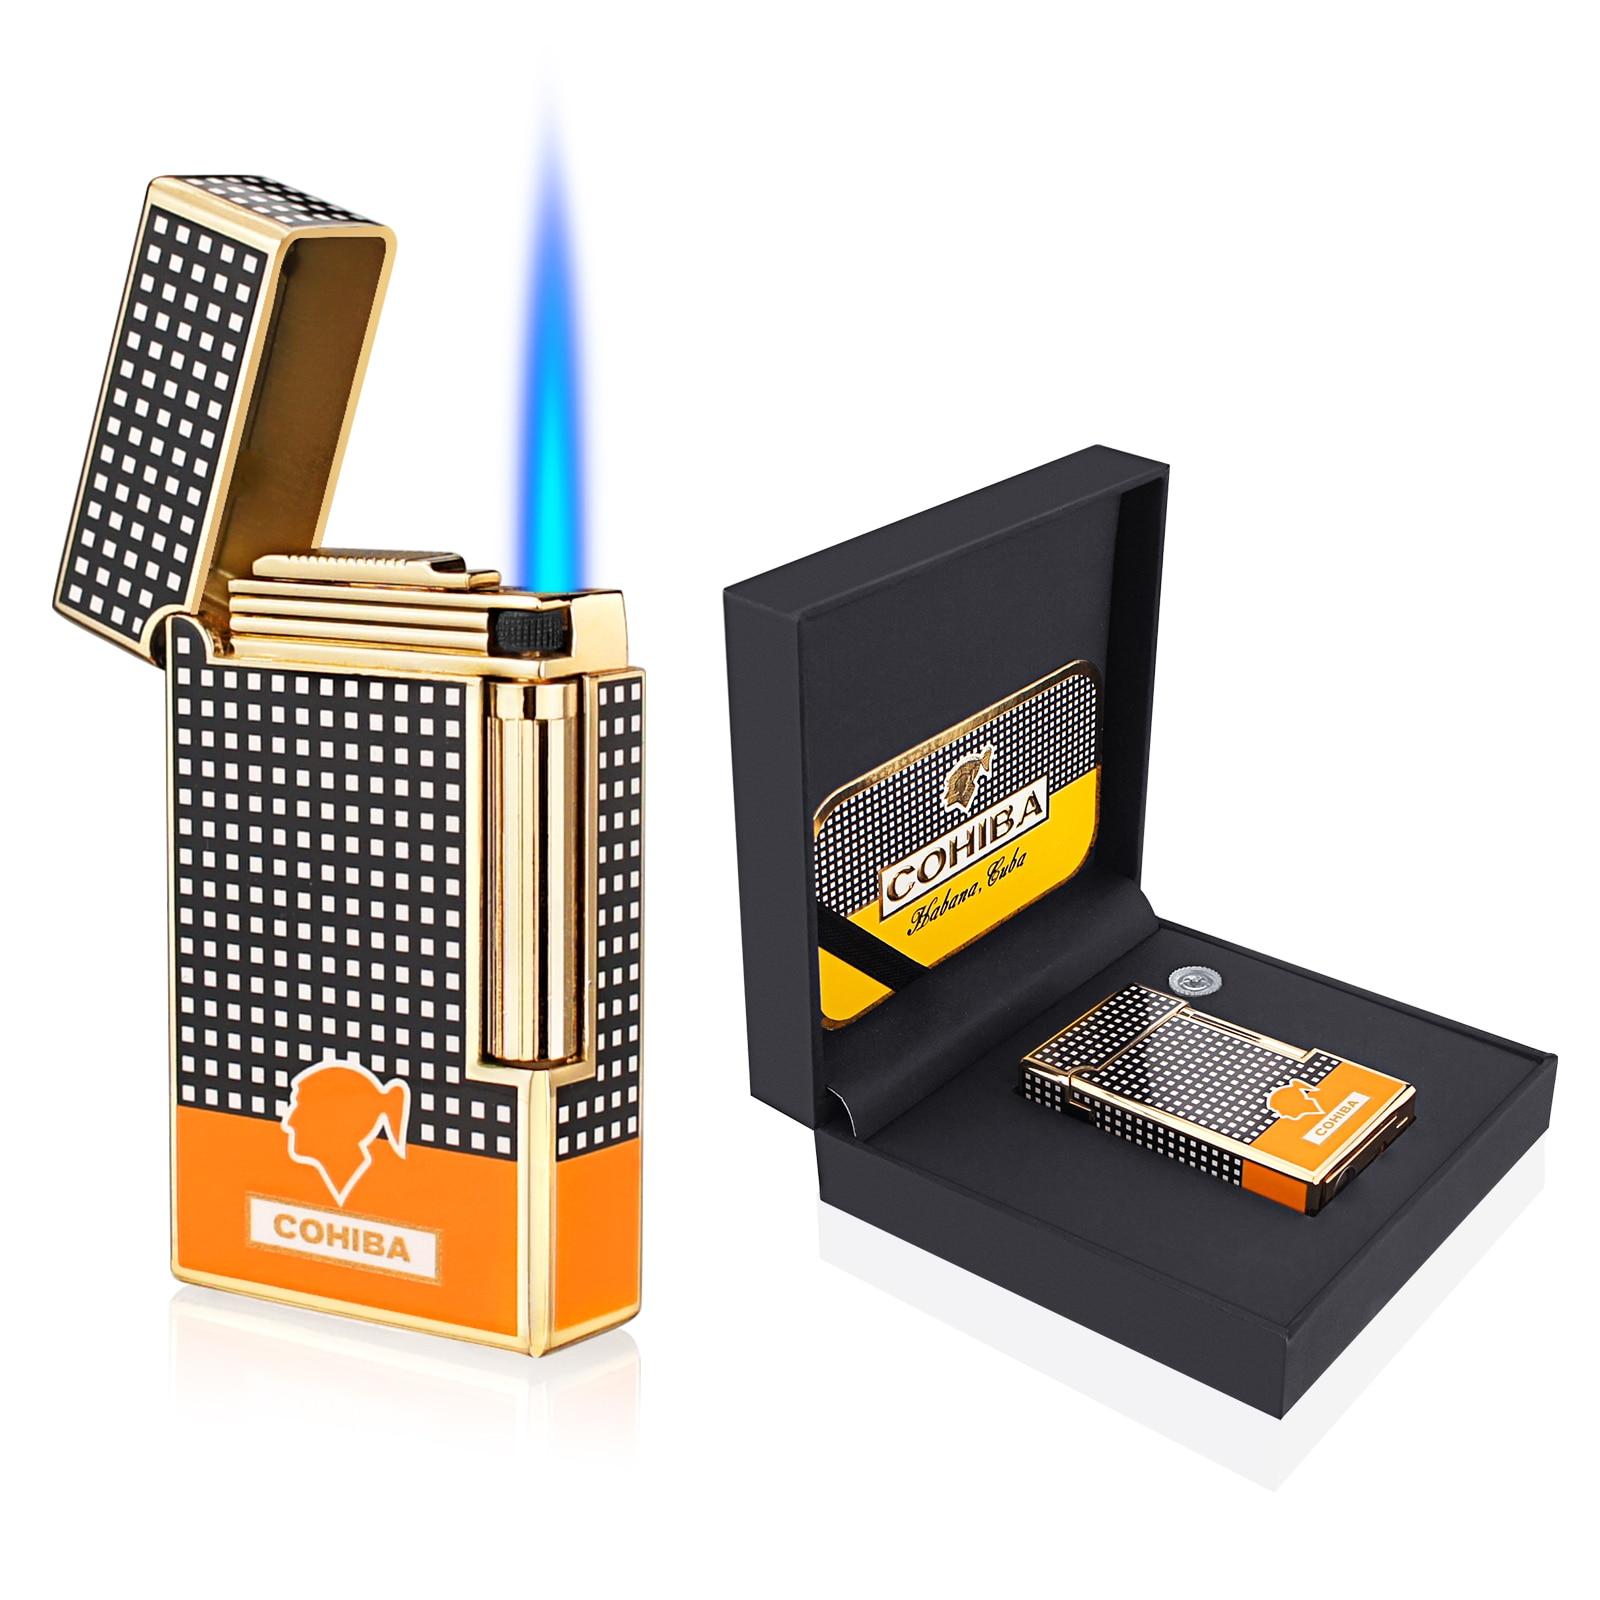 Cigar Lighter Cohiba Torch Jet Flame Refillable Butane Gas Flintstones Lighter with Cigar Punch Ciga